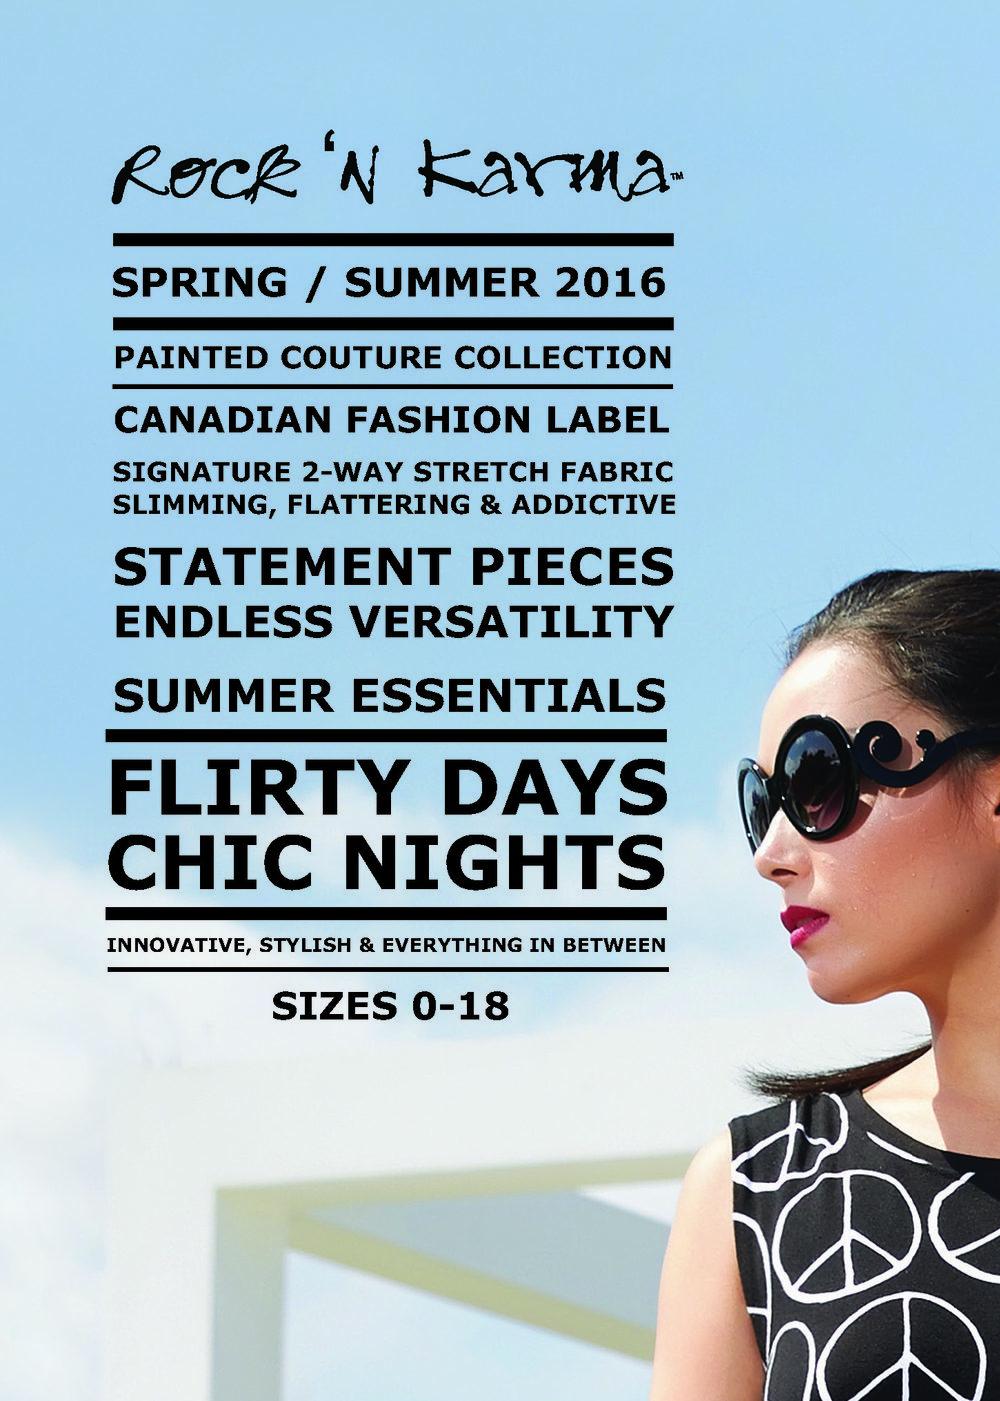 RockNKarma spring - summer 2016 Brochure_Page_02.jpg